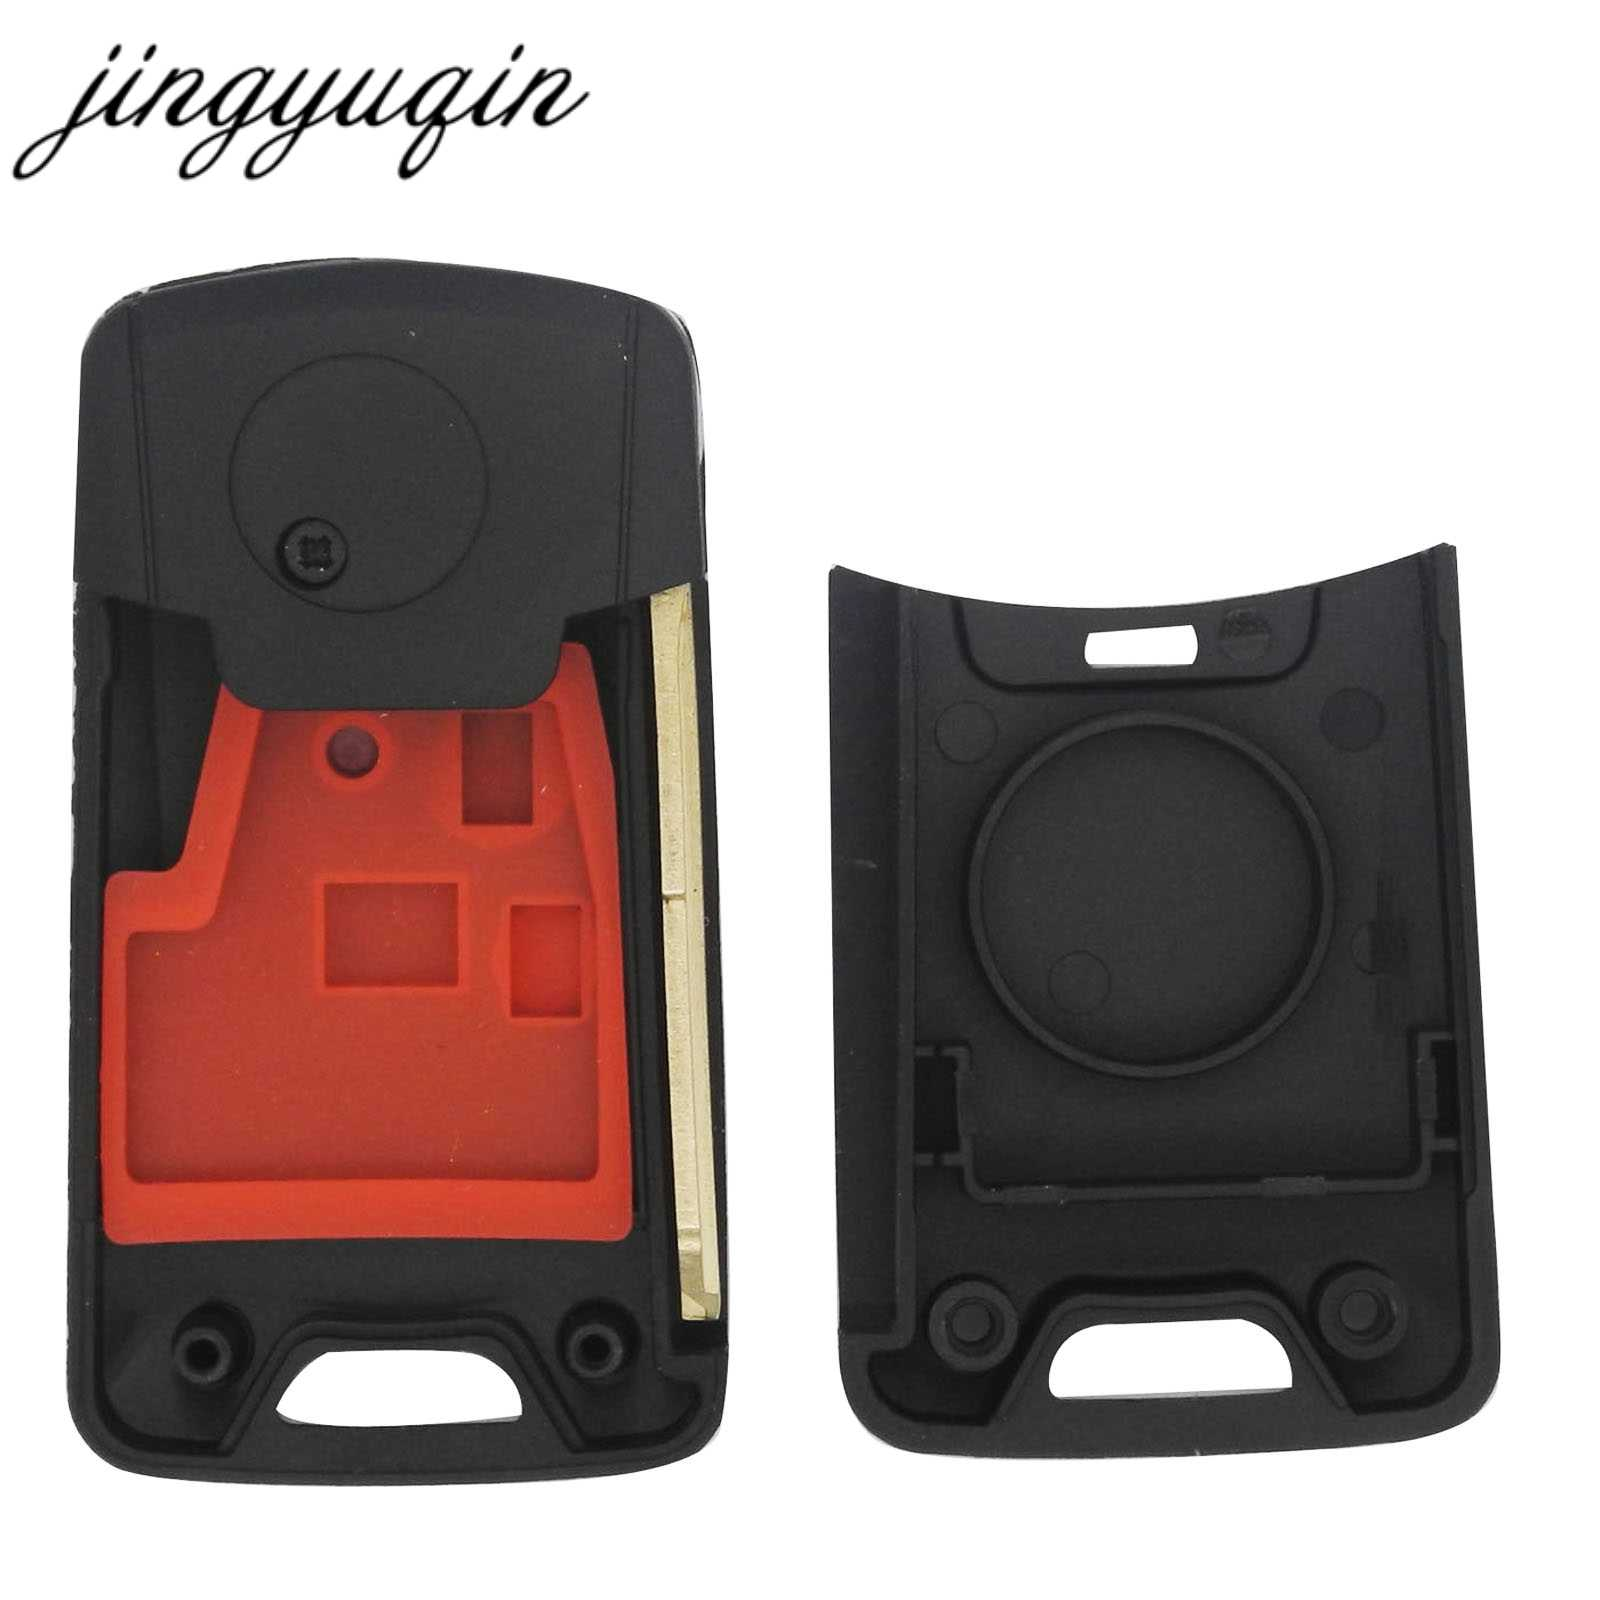 jingyuqin 10pcs Modified 2 Button Folding Key Shell Fob Flip Remote Key  Case for Proton Waja Saga Icin Yedek Anahta Wira Persona